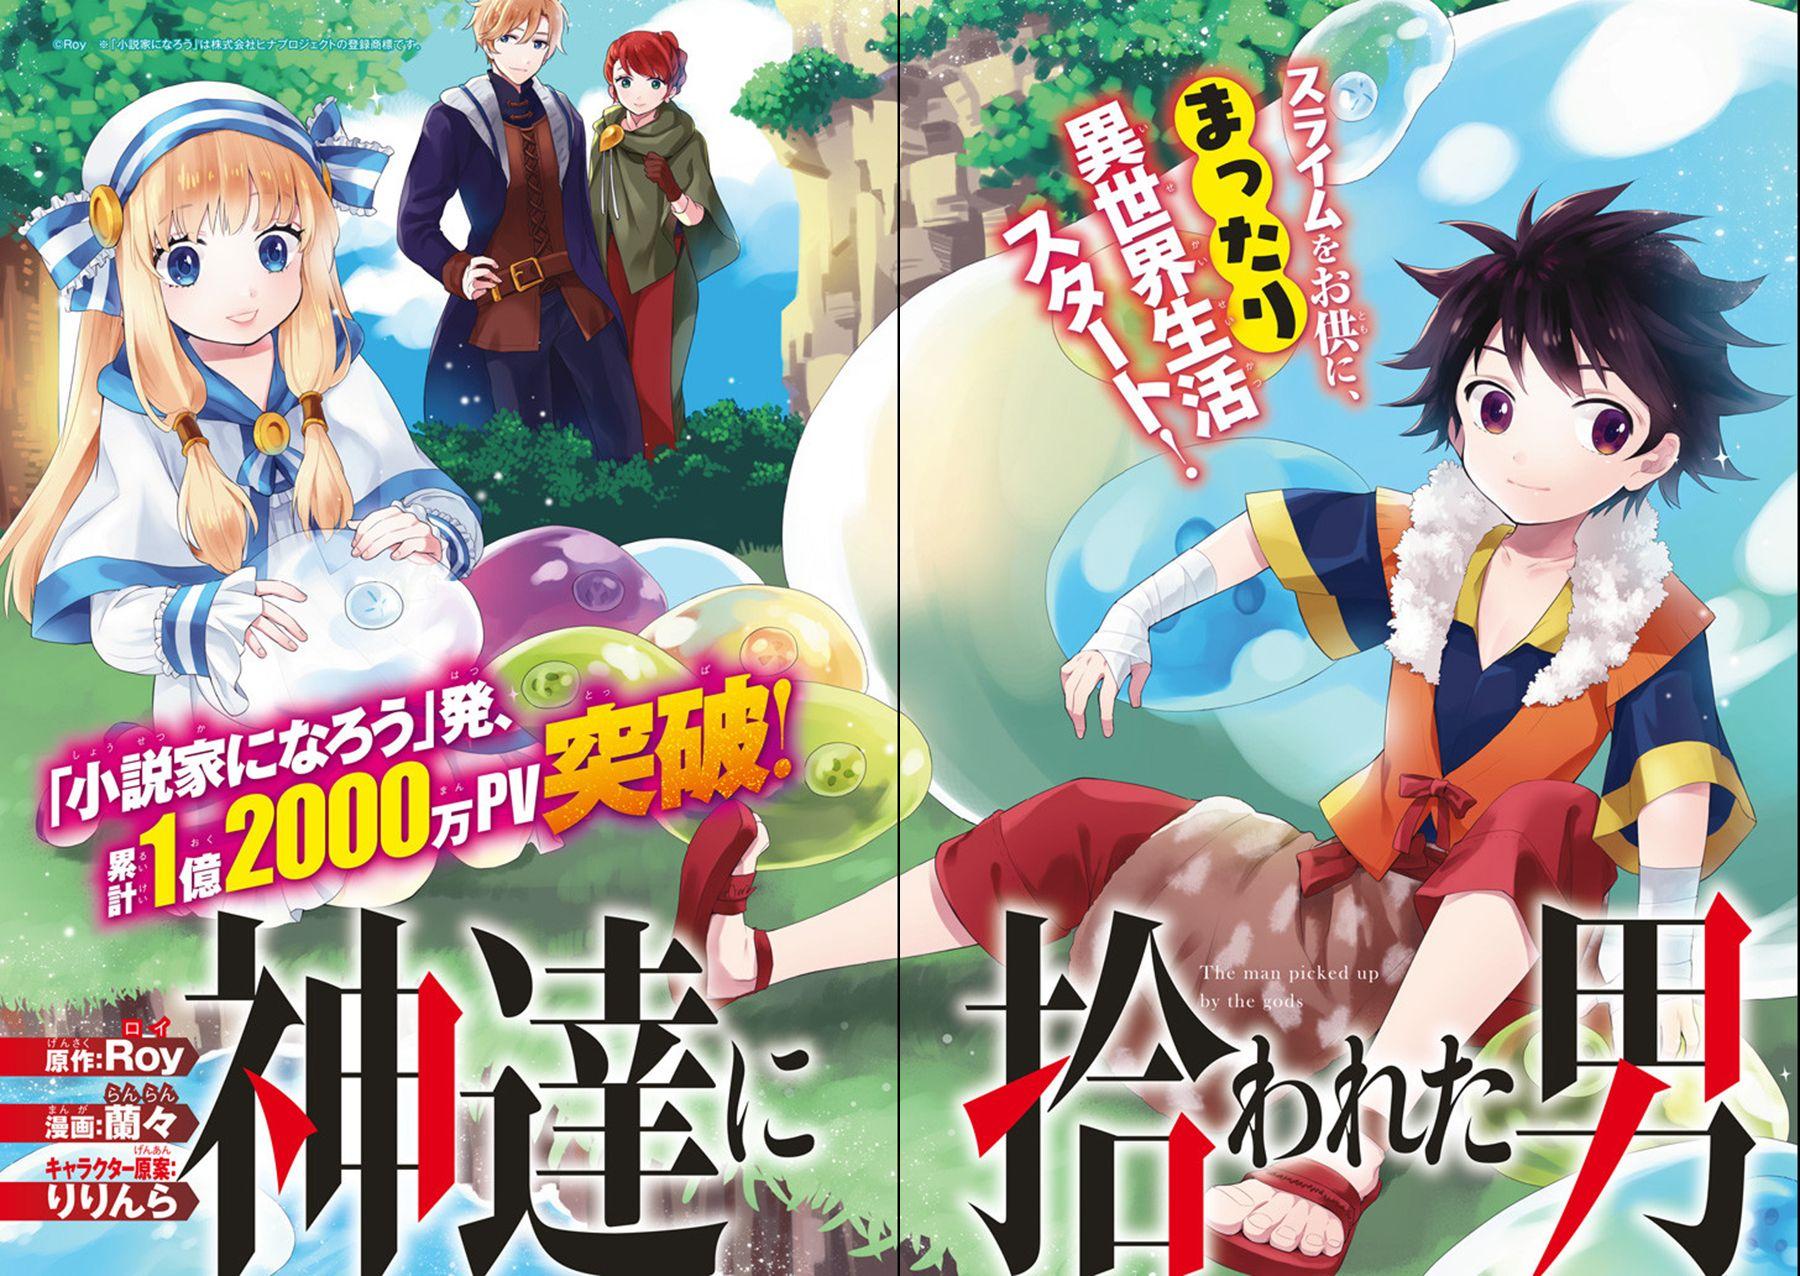 Kamitachi ni Hirowareta Otoko chapter 1 page 3 - Mangakakalot com